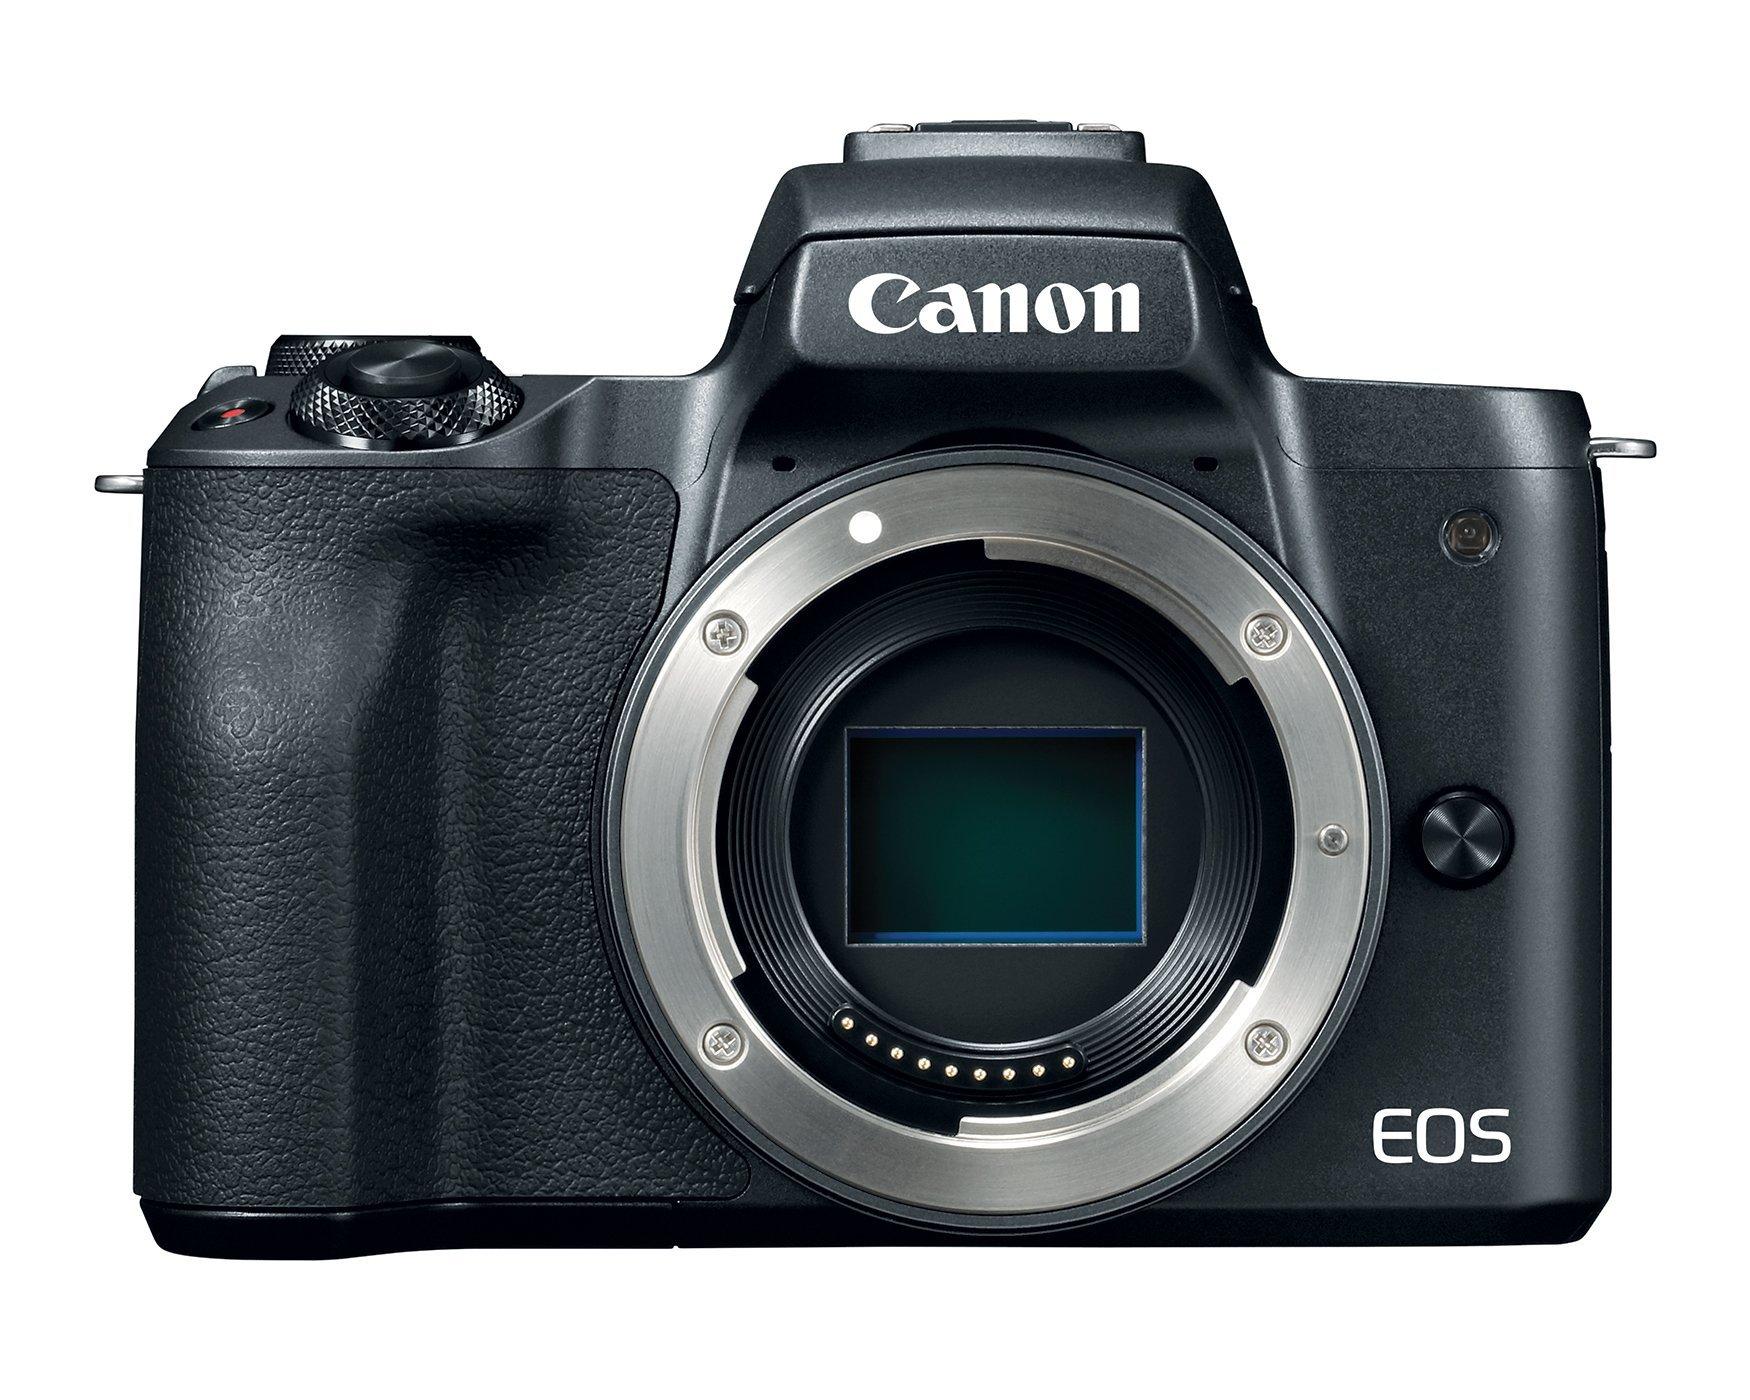 Canon Mirrorless Camera Body [EOS M50] with 4K Video, 24.1 Megapixel (APS-C) CMOS Sensor - Black (Renewed) by Canon